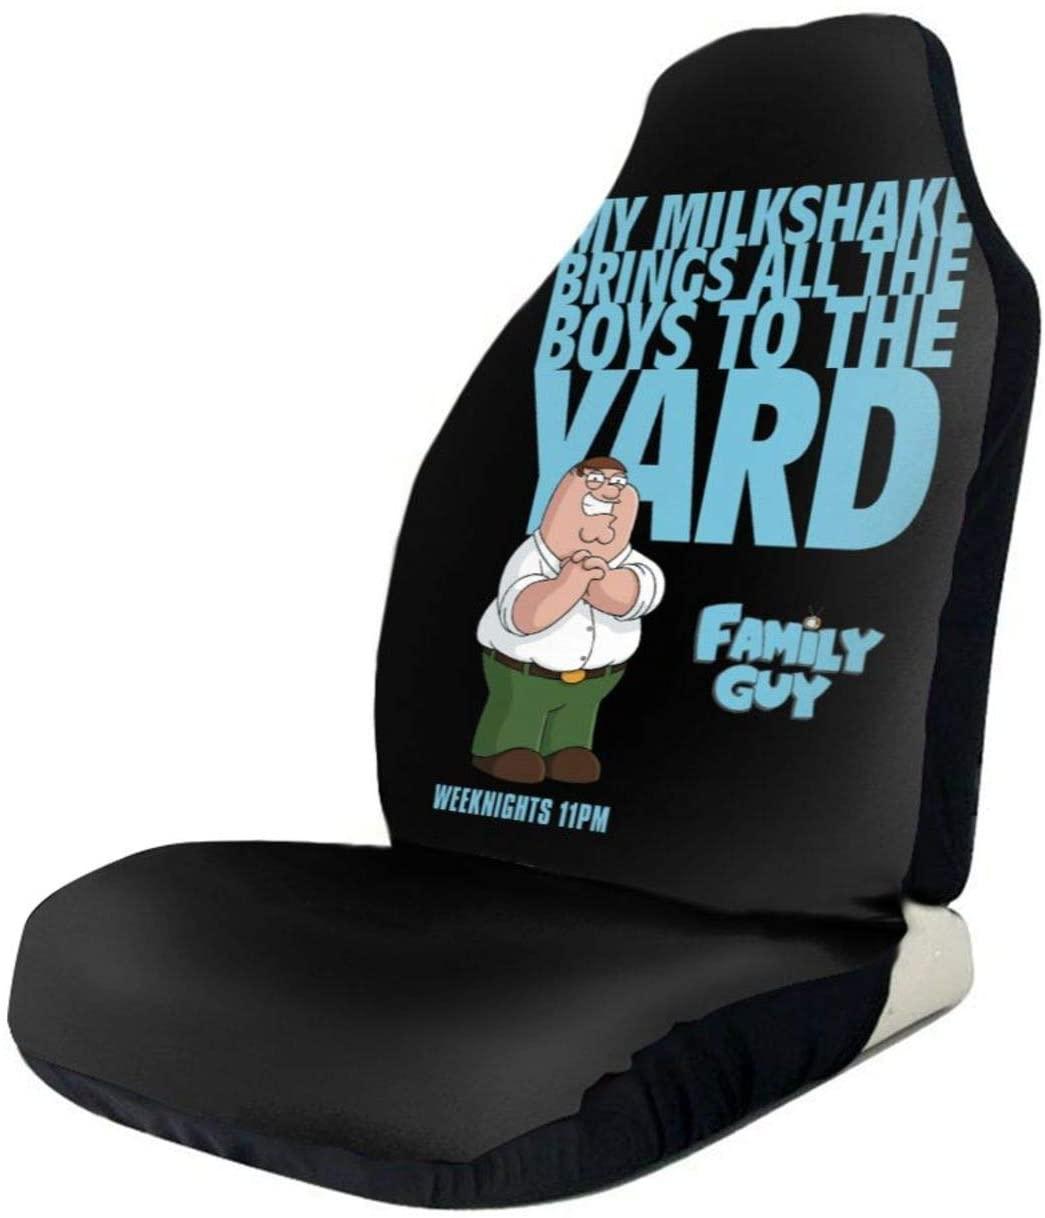 Lingassassin Family Guy Most Car SUV Van Truck Sedan Polyester Car Seat Covers